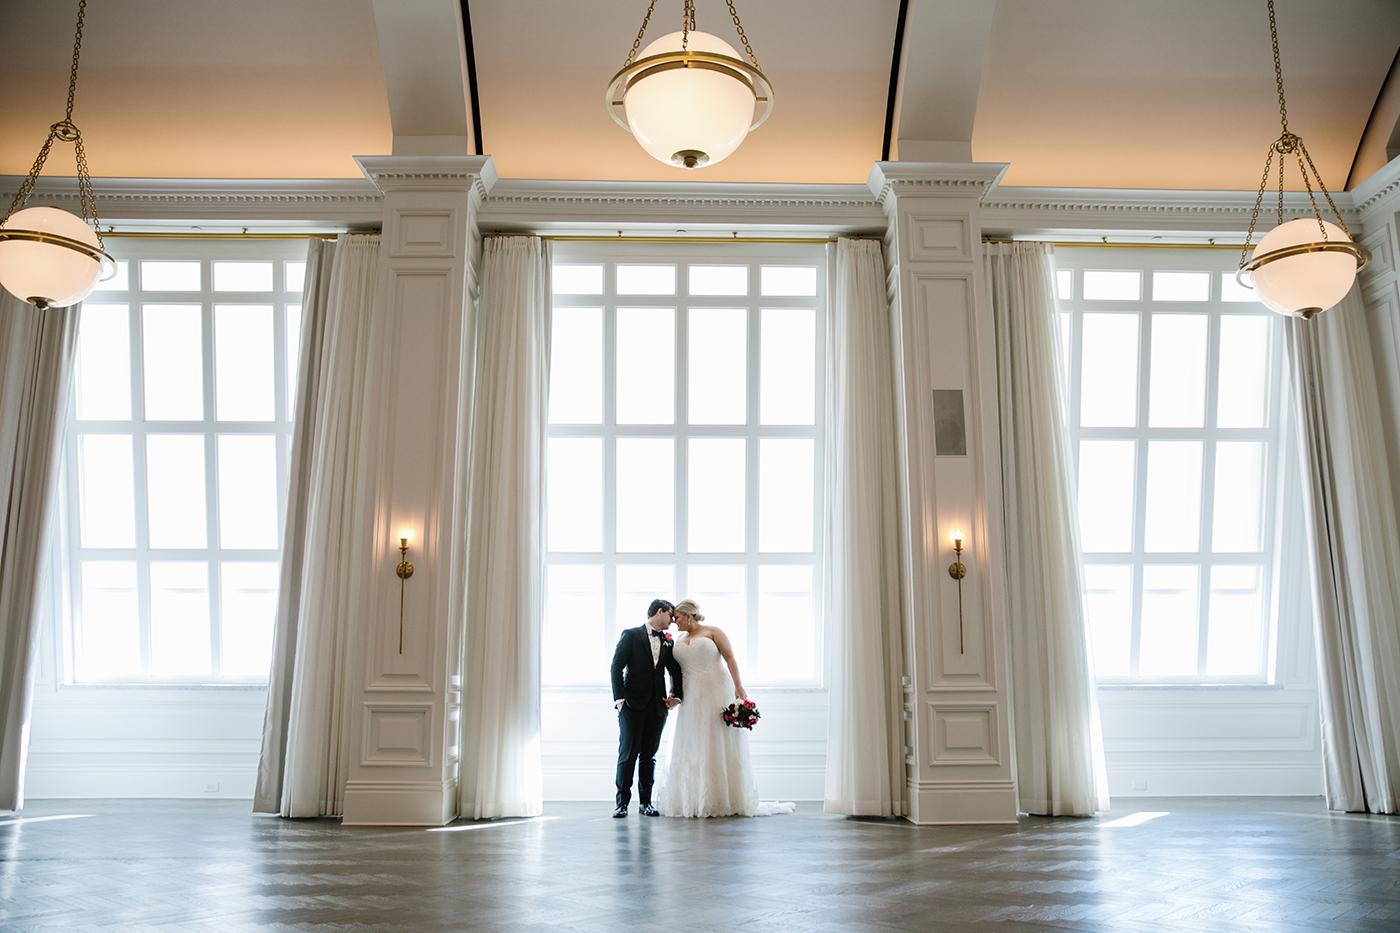 Dallas Weddings Planner - Allday Events - Katie + Matthew at The Adolphus Hotel - 200.jpg